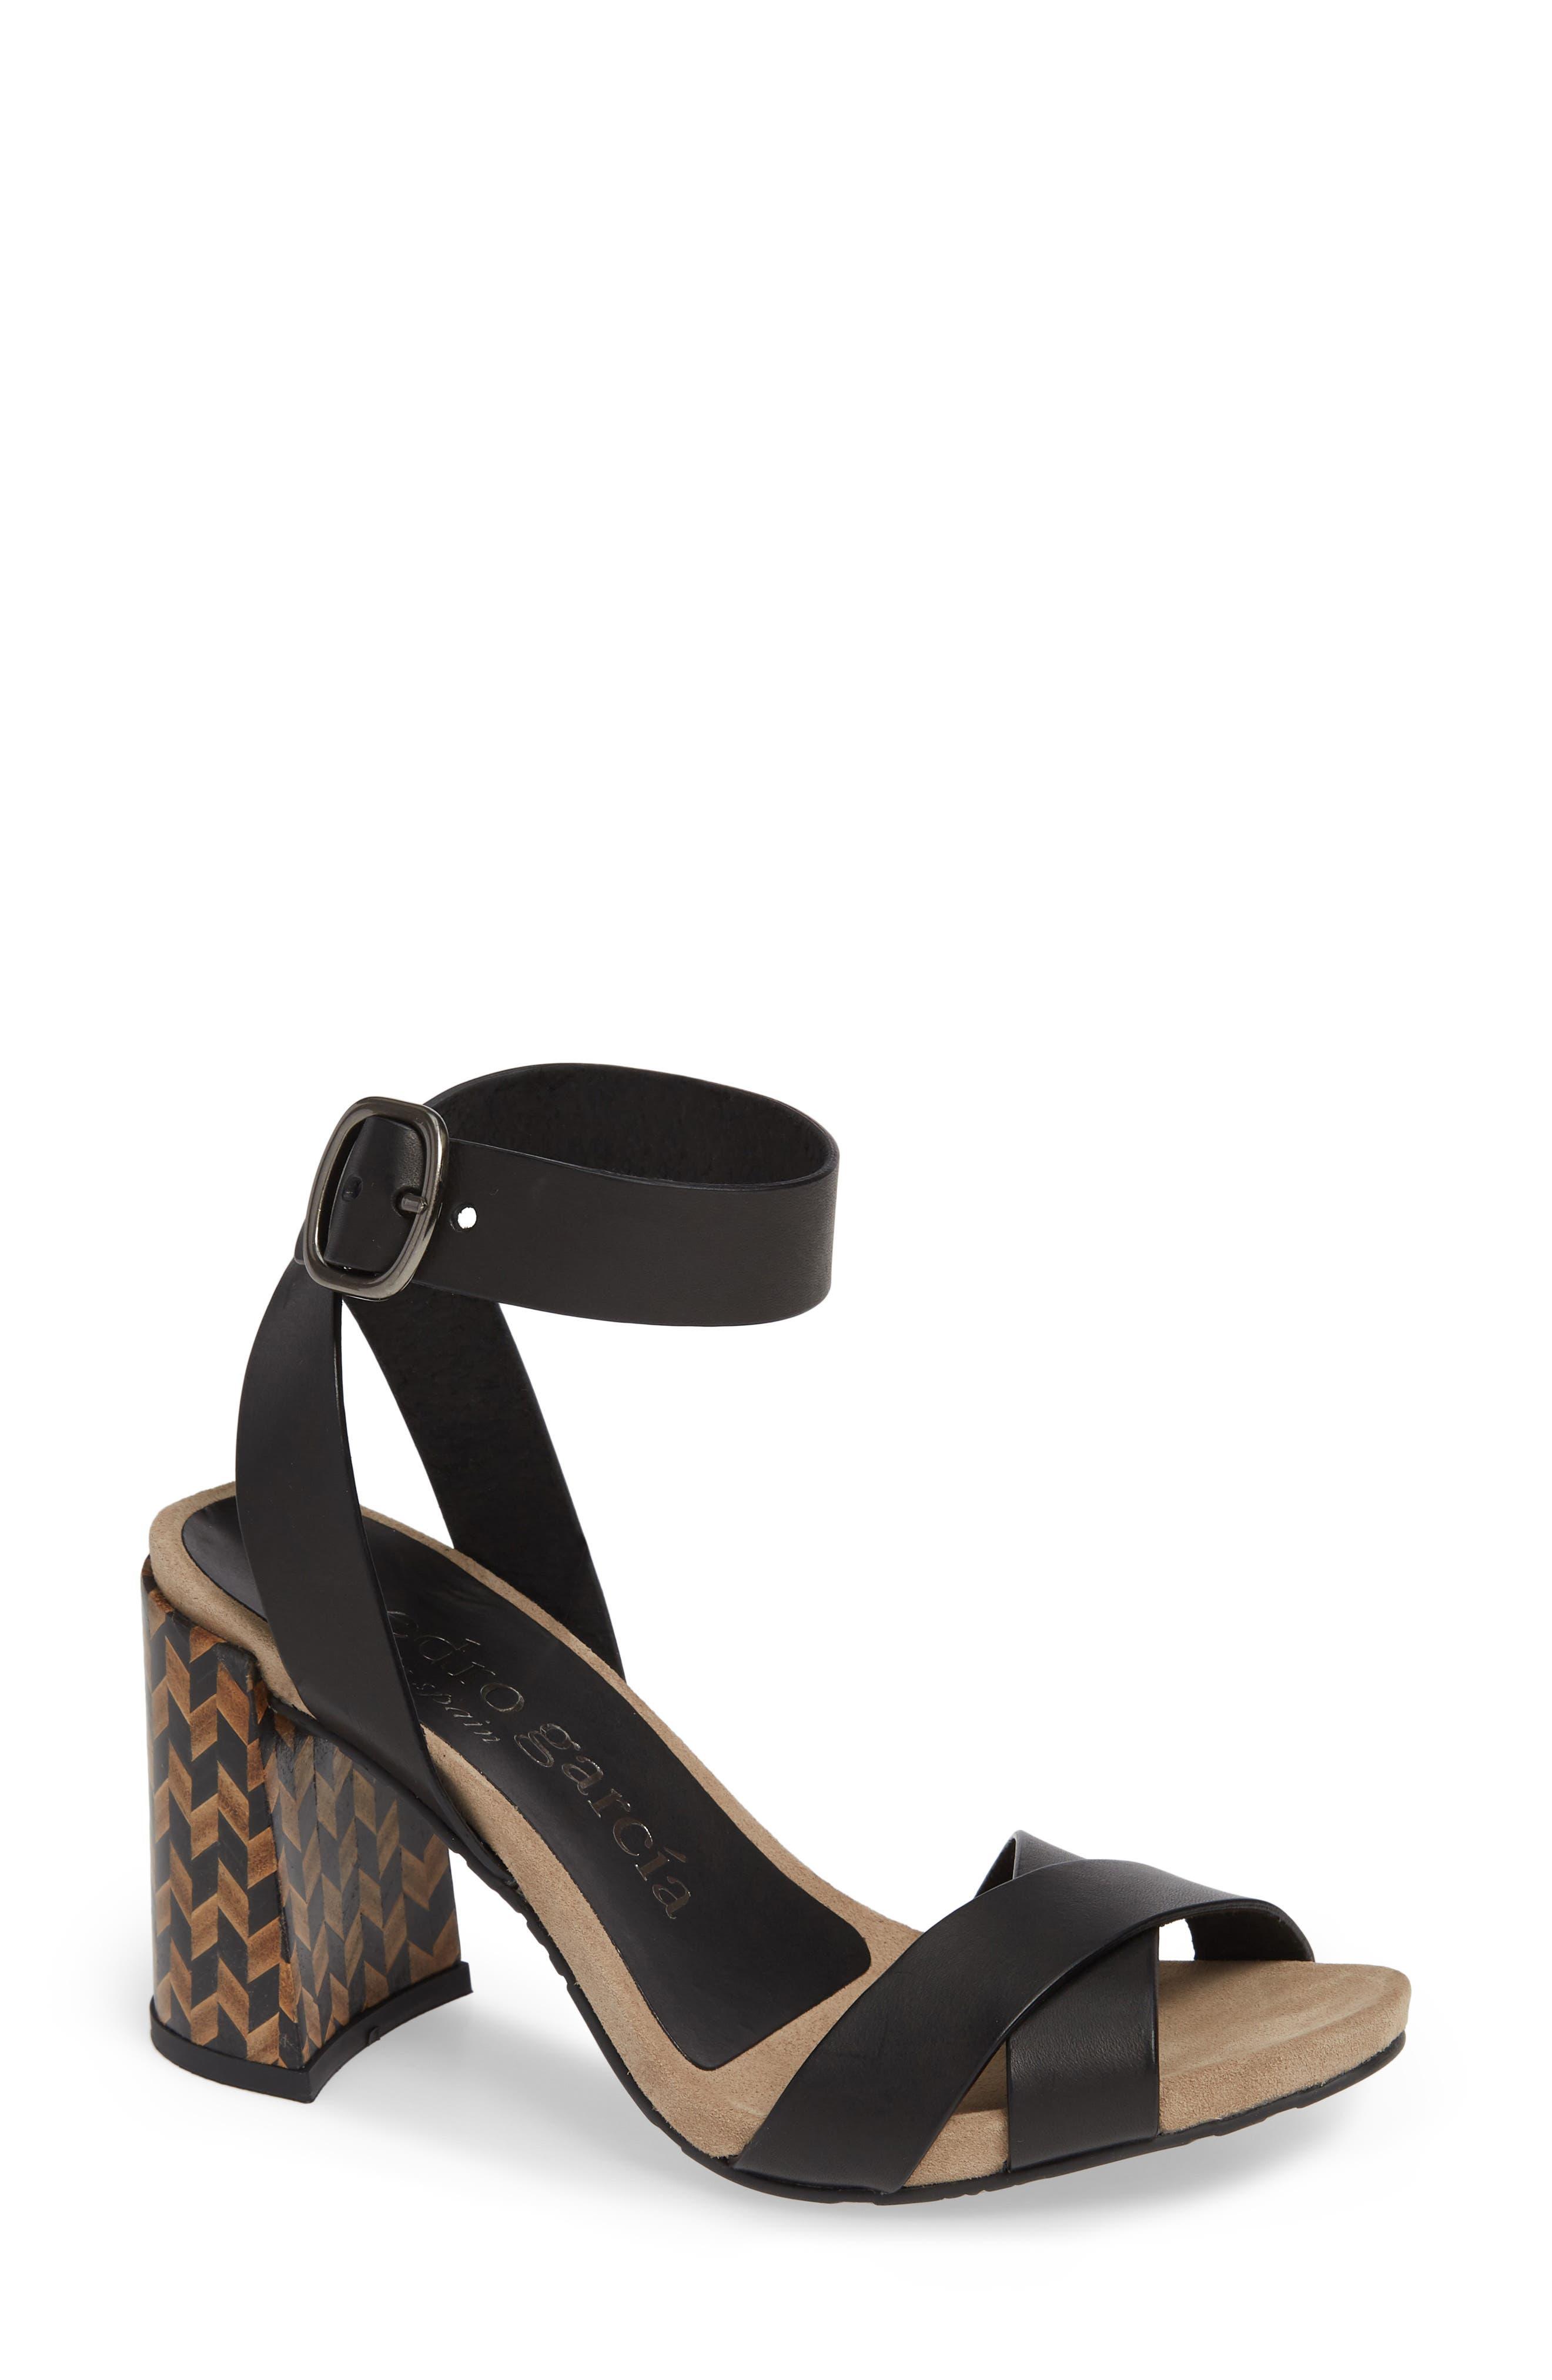 Pedro Garcia Yemba Embellished Heel Sandal, Size - (Nordstrom Exclusive)